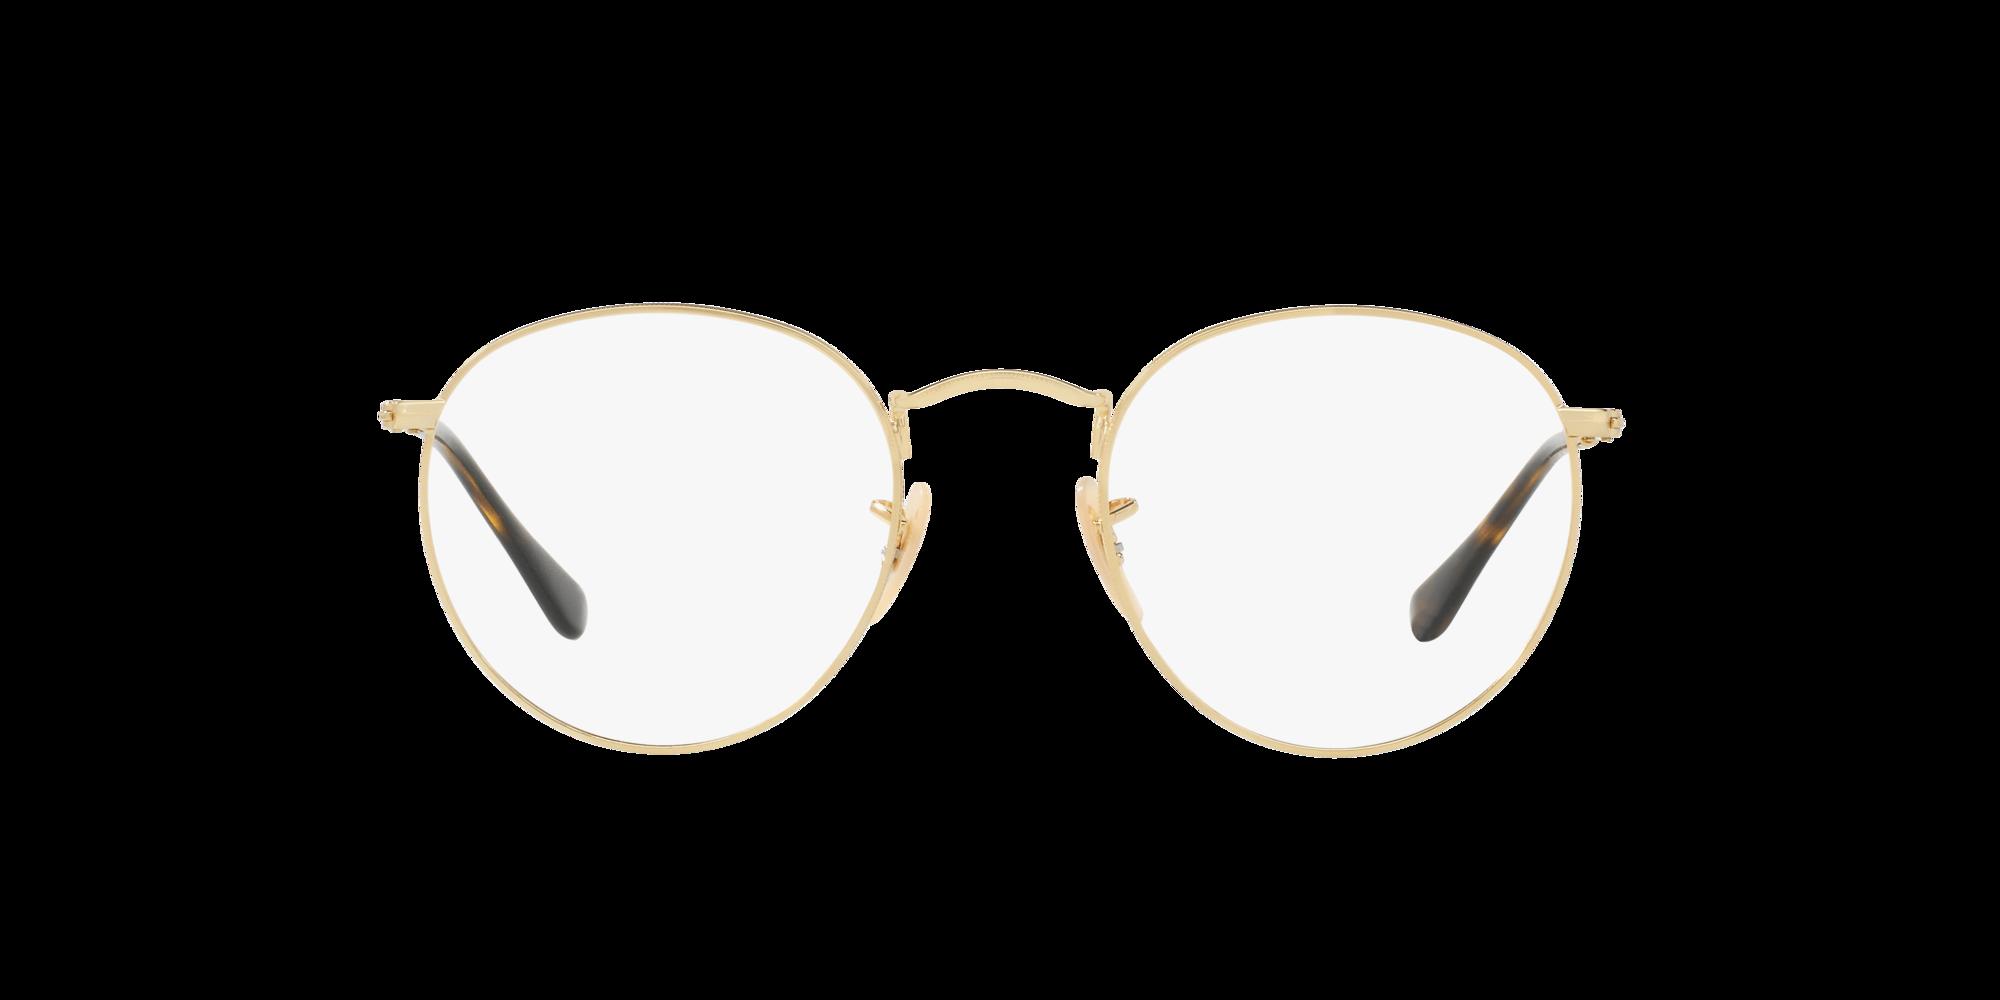 54b7307d99 Comprar lentes ópticos